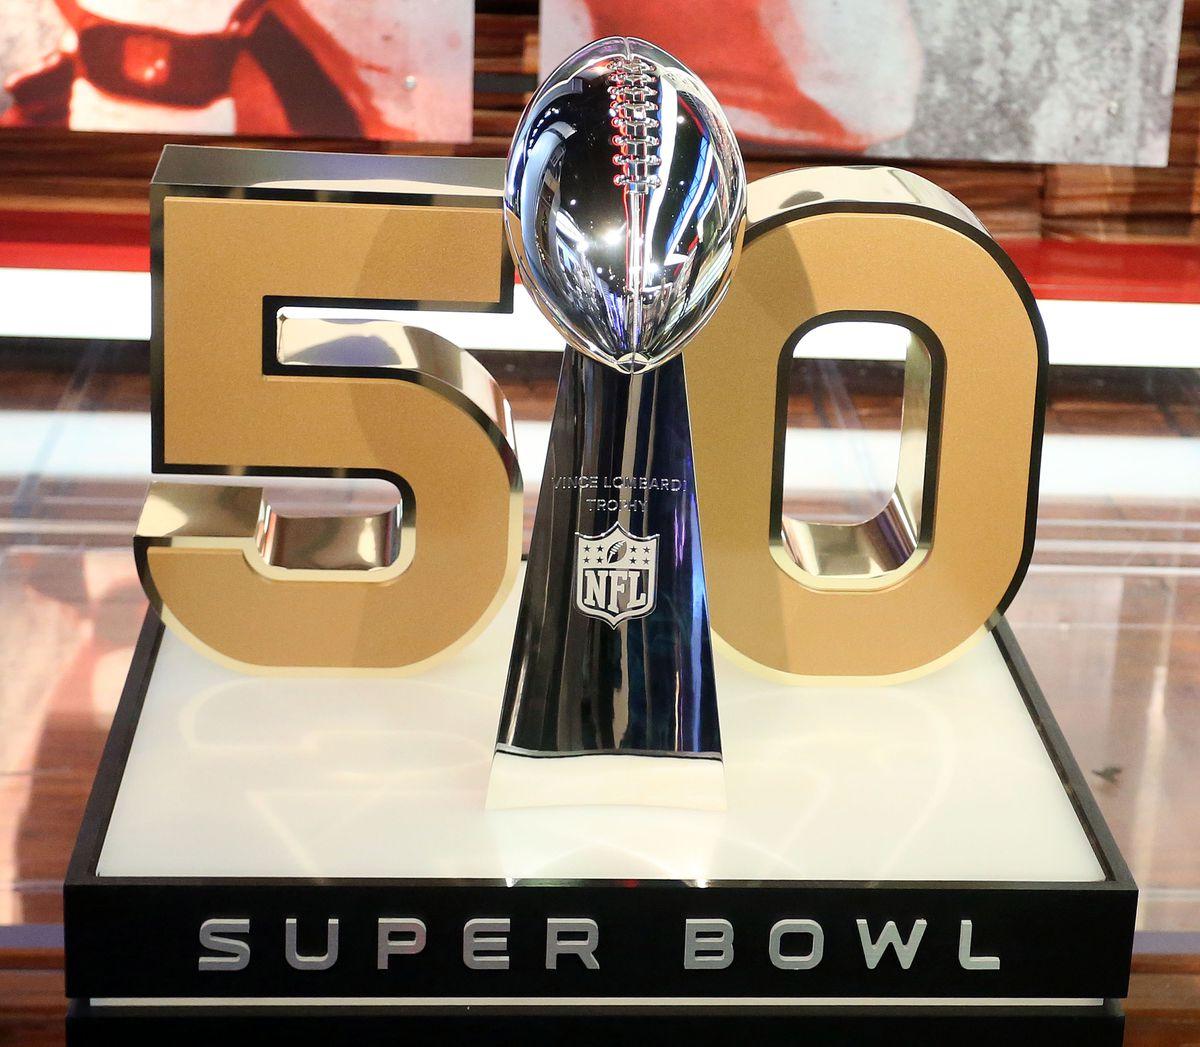 The Super Bowl.